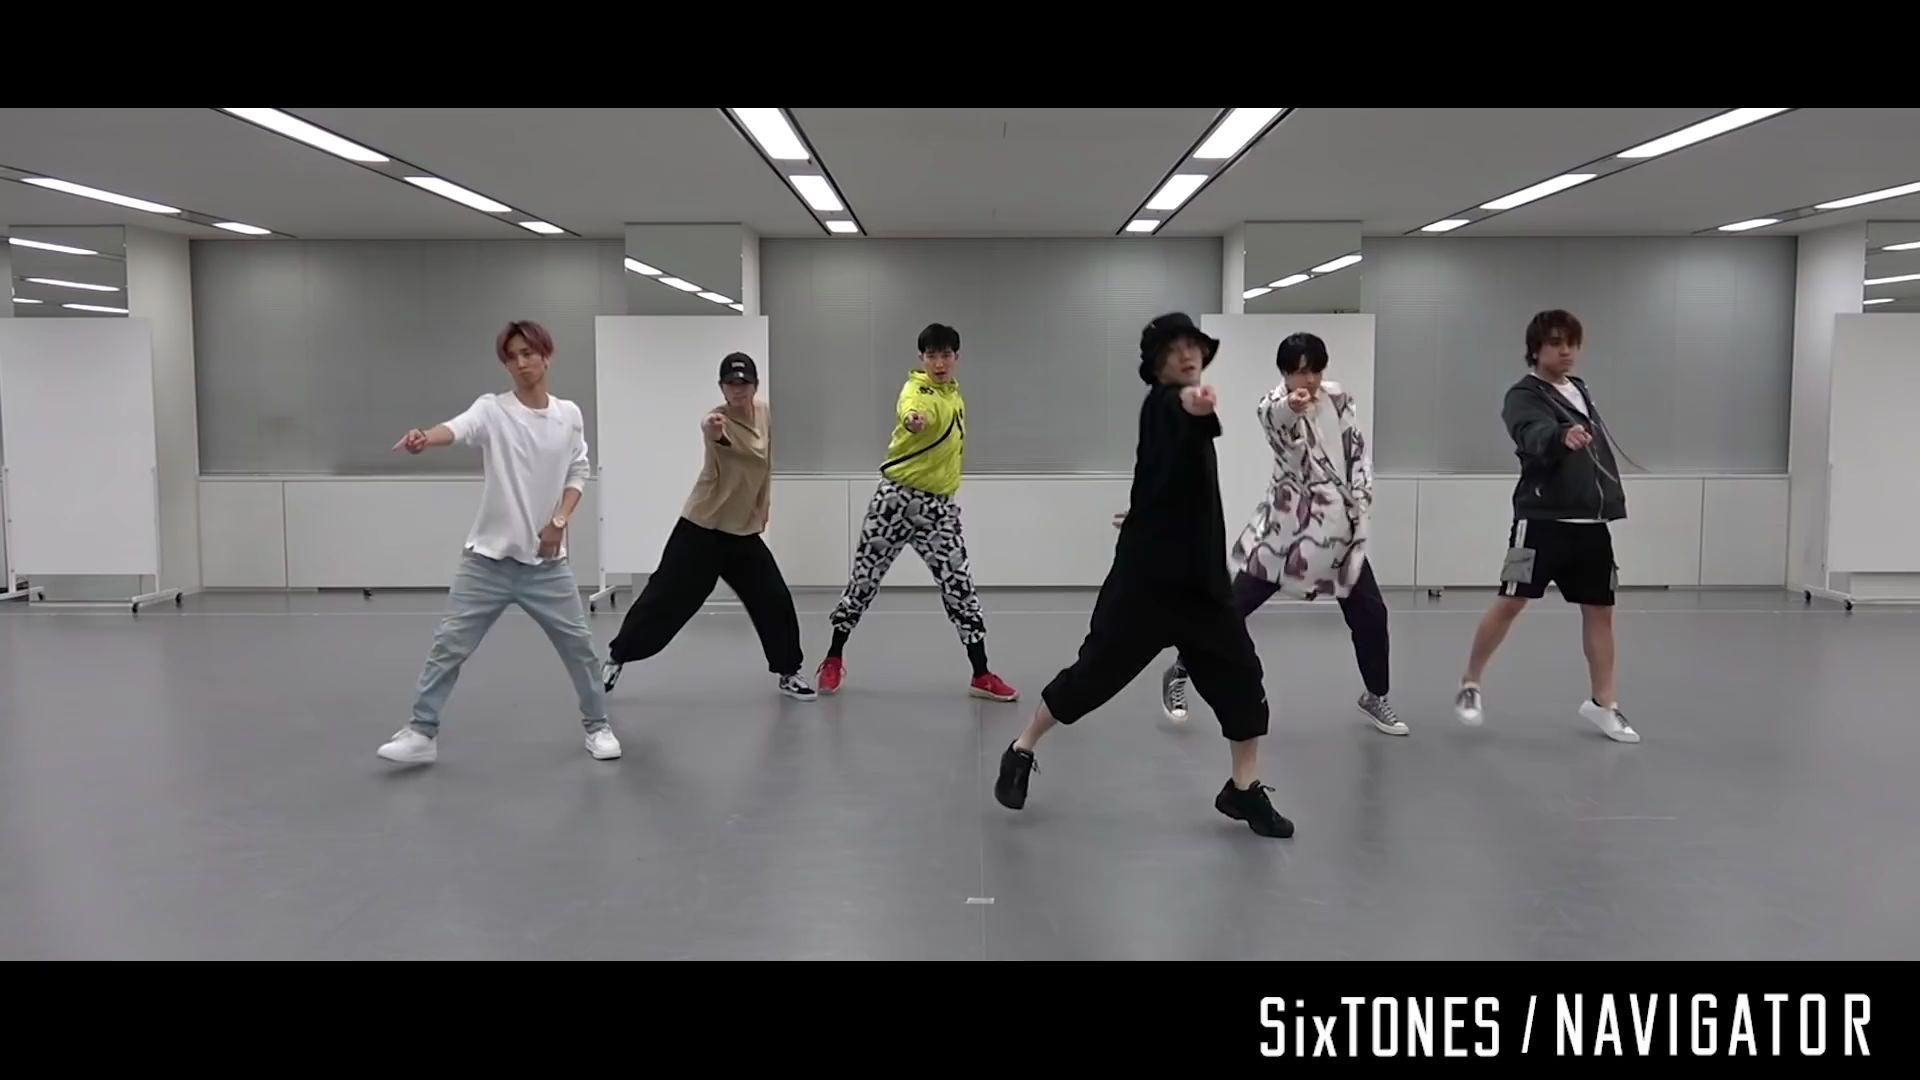 Sixtones Navigator Dance Practice 哔哩哔哩 つロ干杯 Bilibili